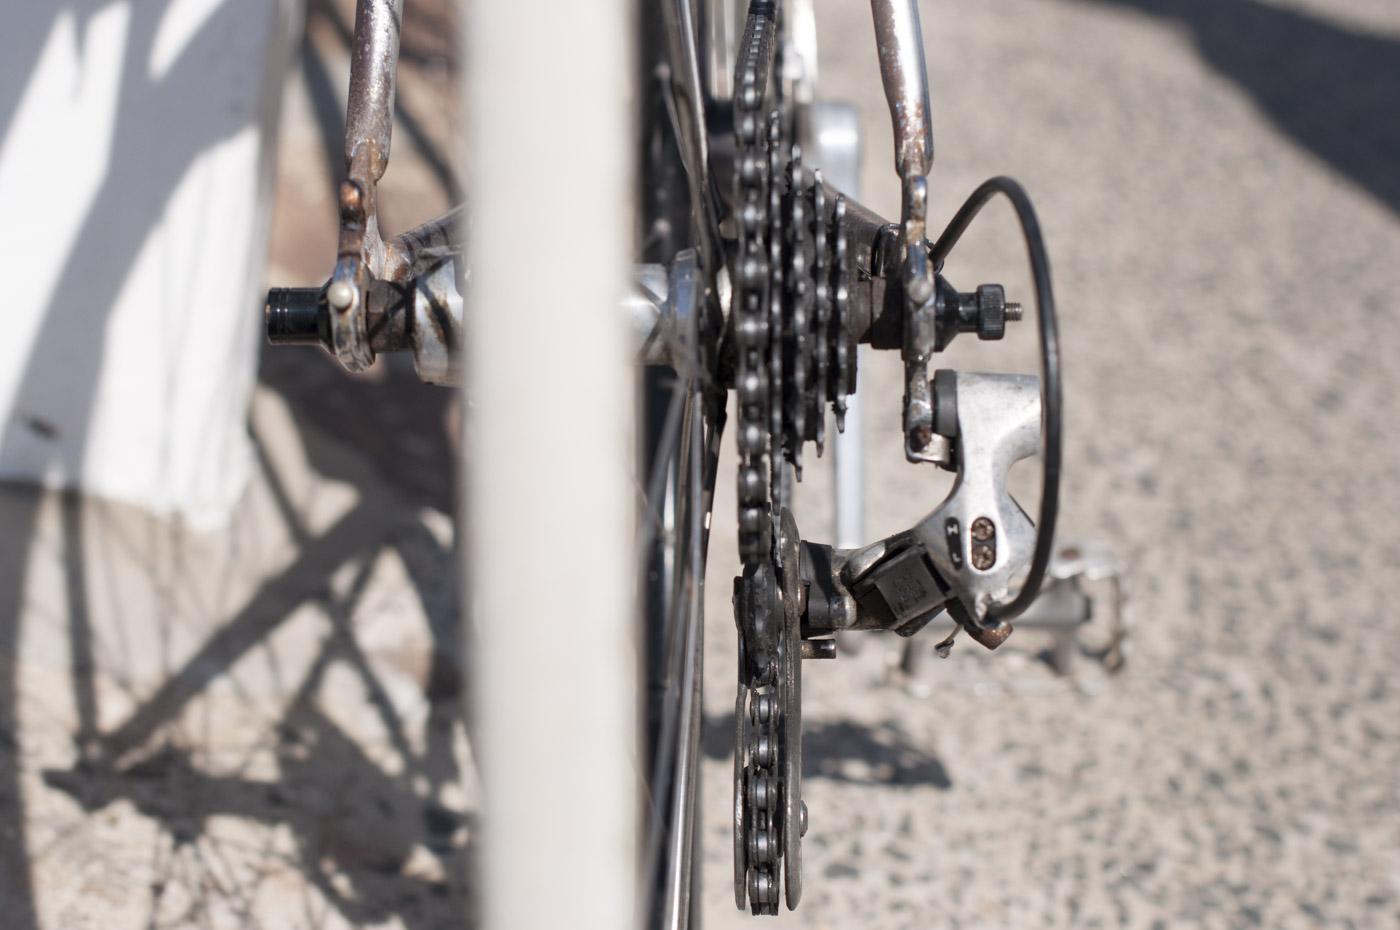 The Biketorialist 5 Speed Road Bicycle Bondi Beach Sydney